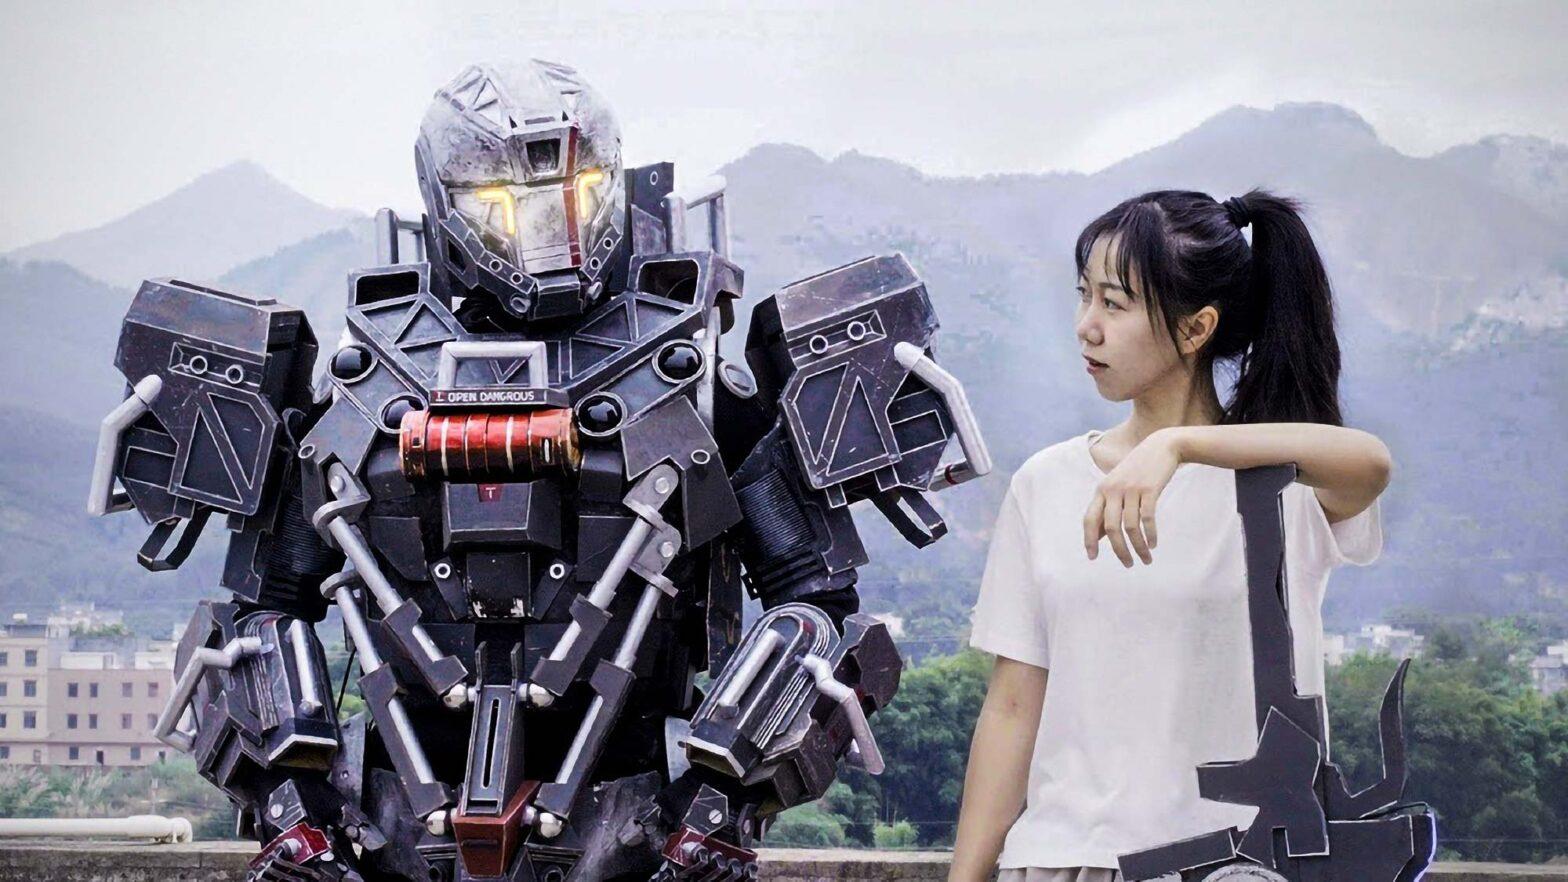 Wearable Robot Suit by Xiao Qian Feng